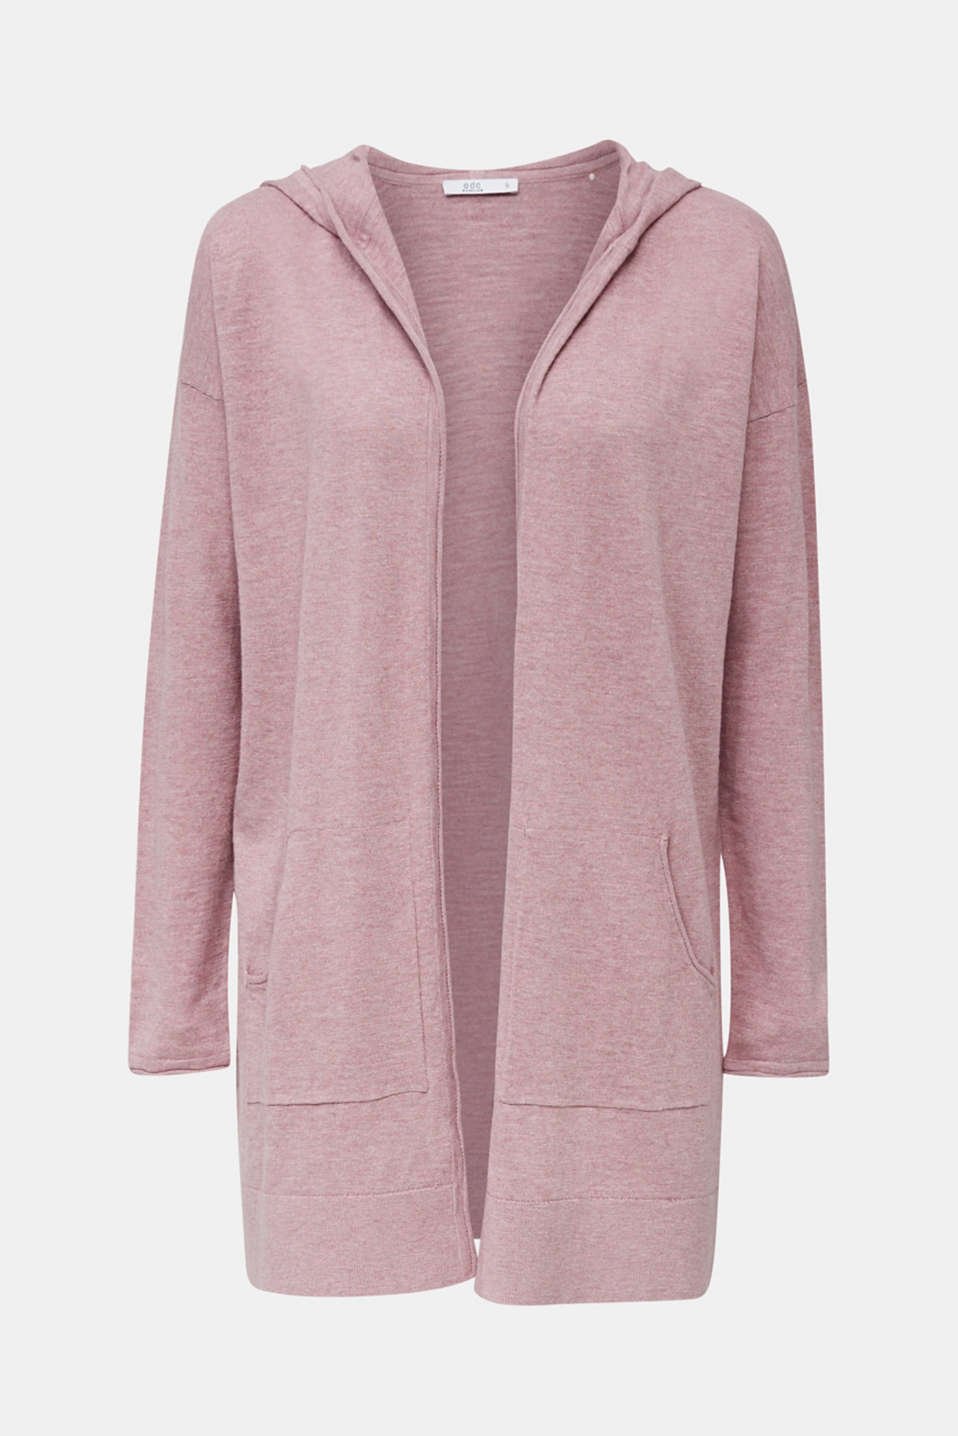 Cardigan, 100% cotton, MAUVE 5, detail image number 6